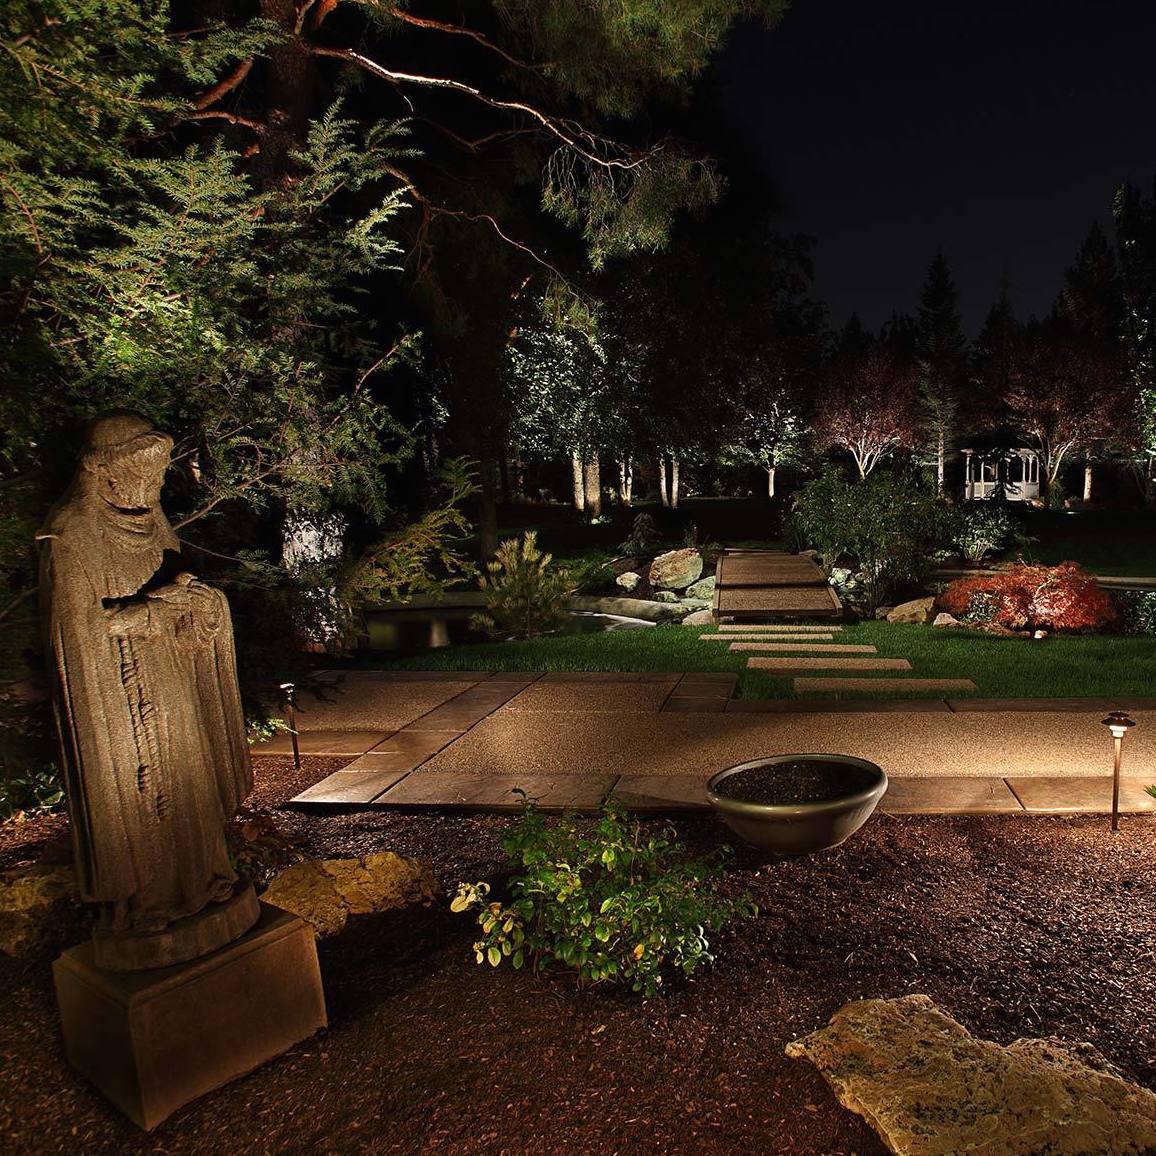 Landscape Lighting Utah: 5 Ways To Add Landscape Lighting To Concrete Hardscaping